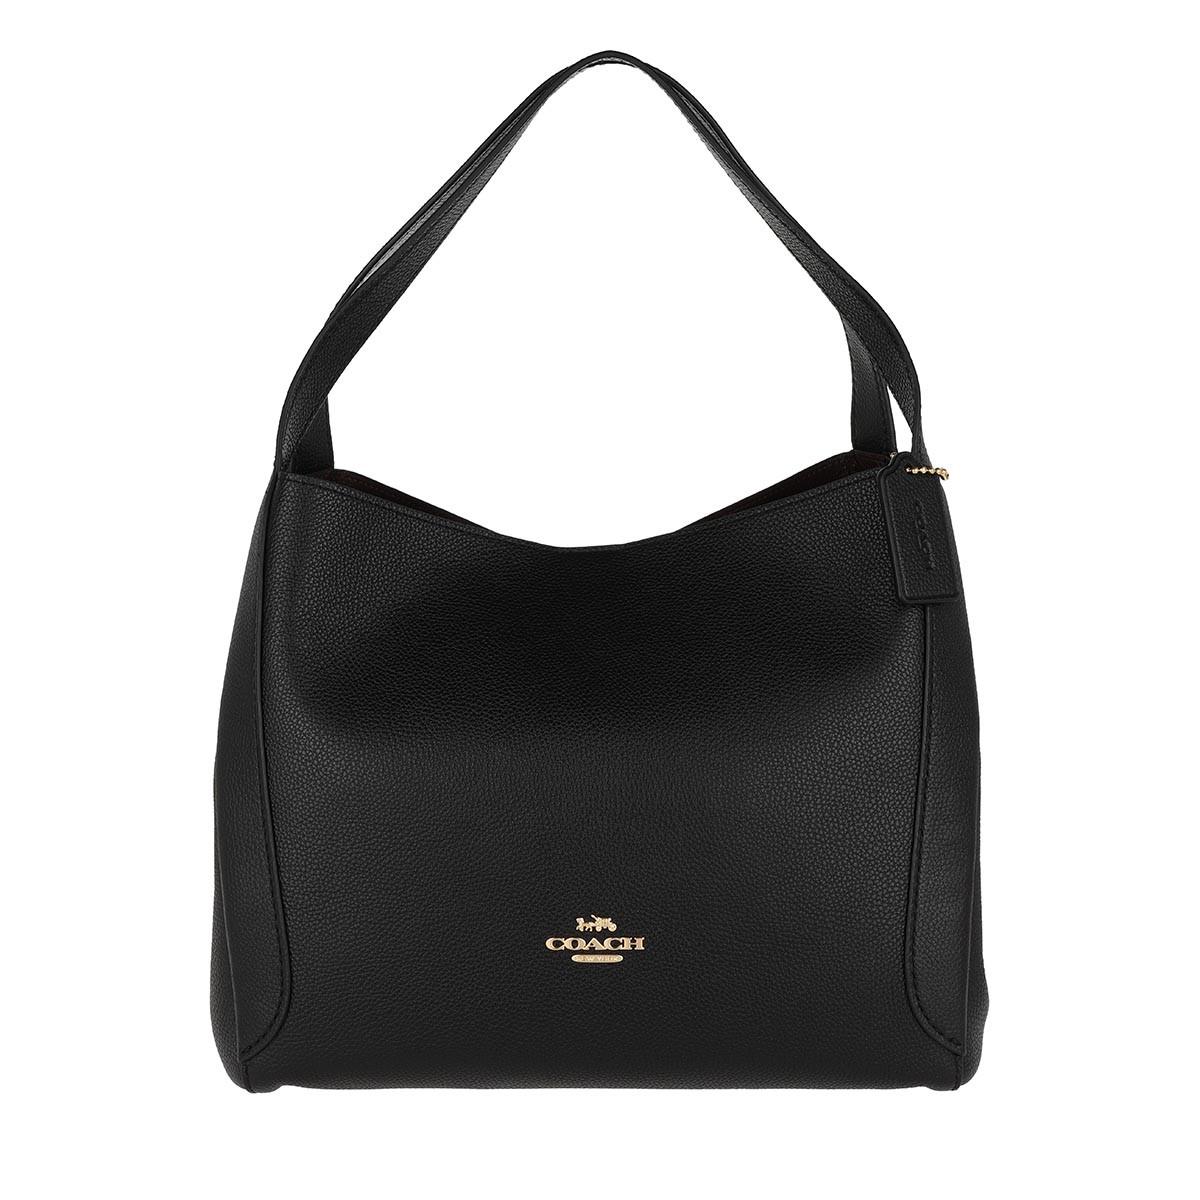 Coach Hobo Bag - Polished Pebble Leather Hadley Hobo Bag Black - in schwarz - für Damen